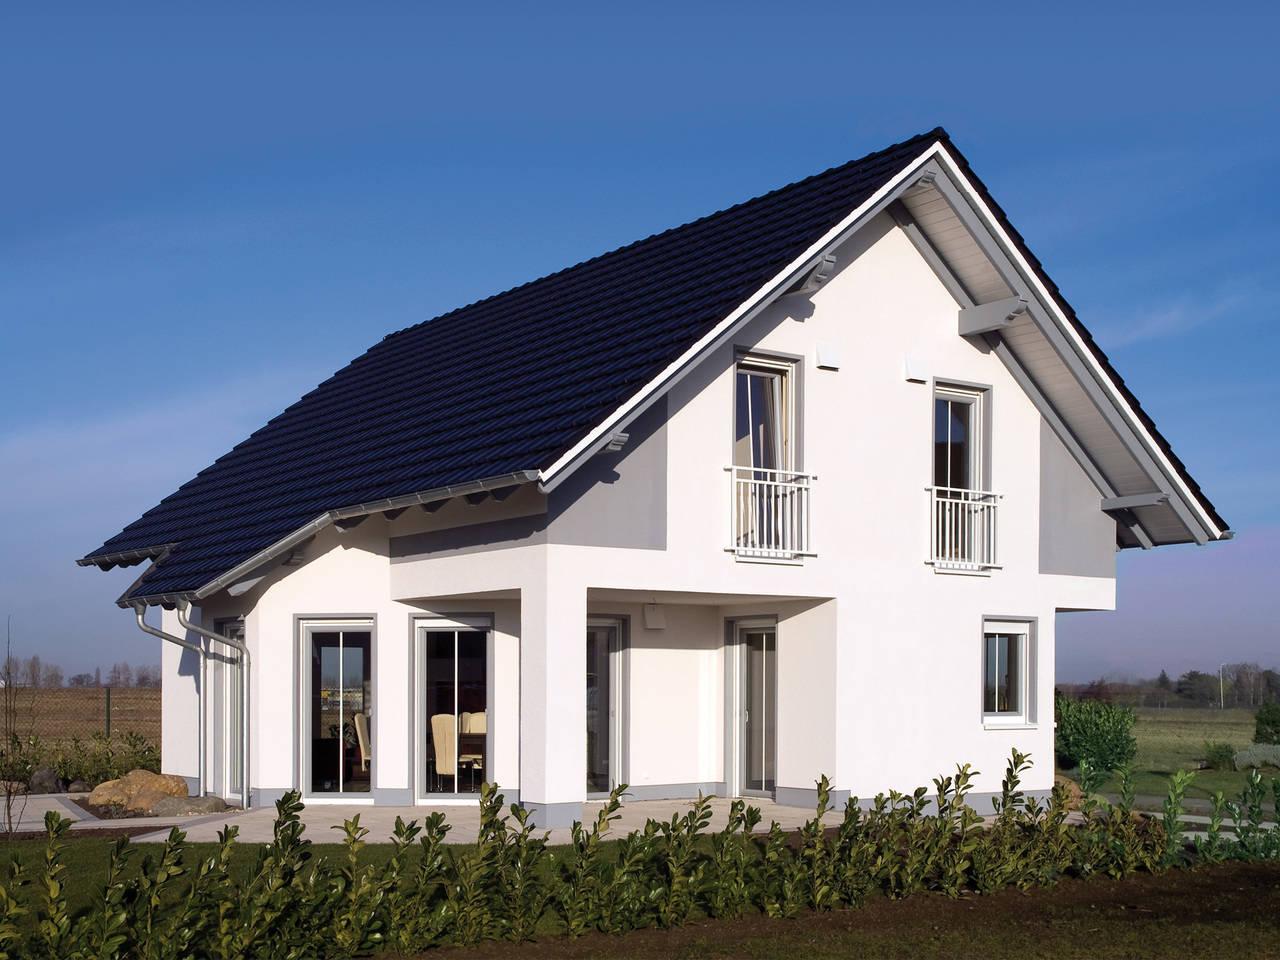 Haustyp VarioFamily 137 von HSE Massivhaus